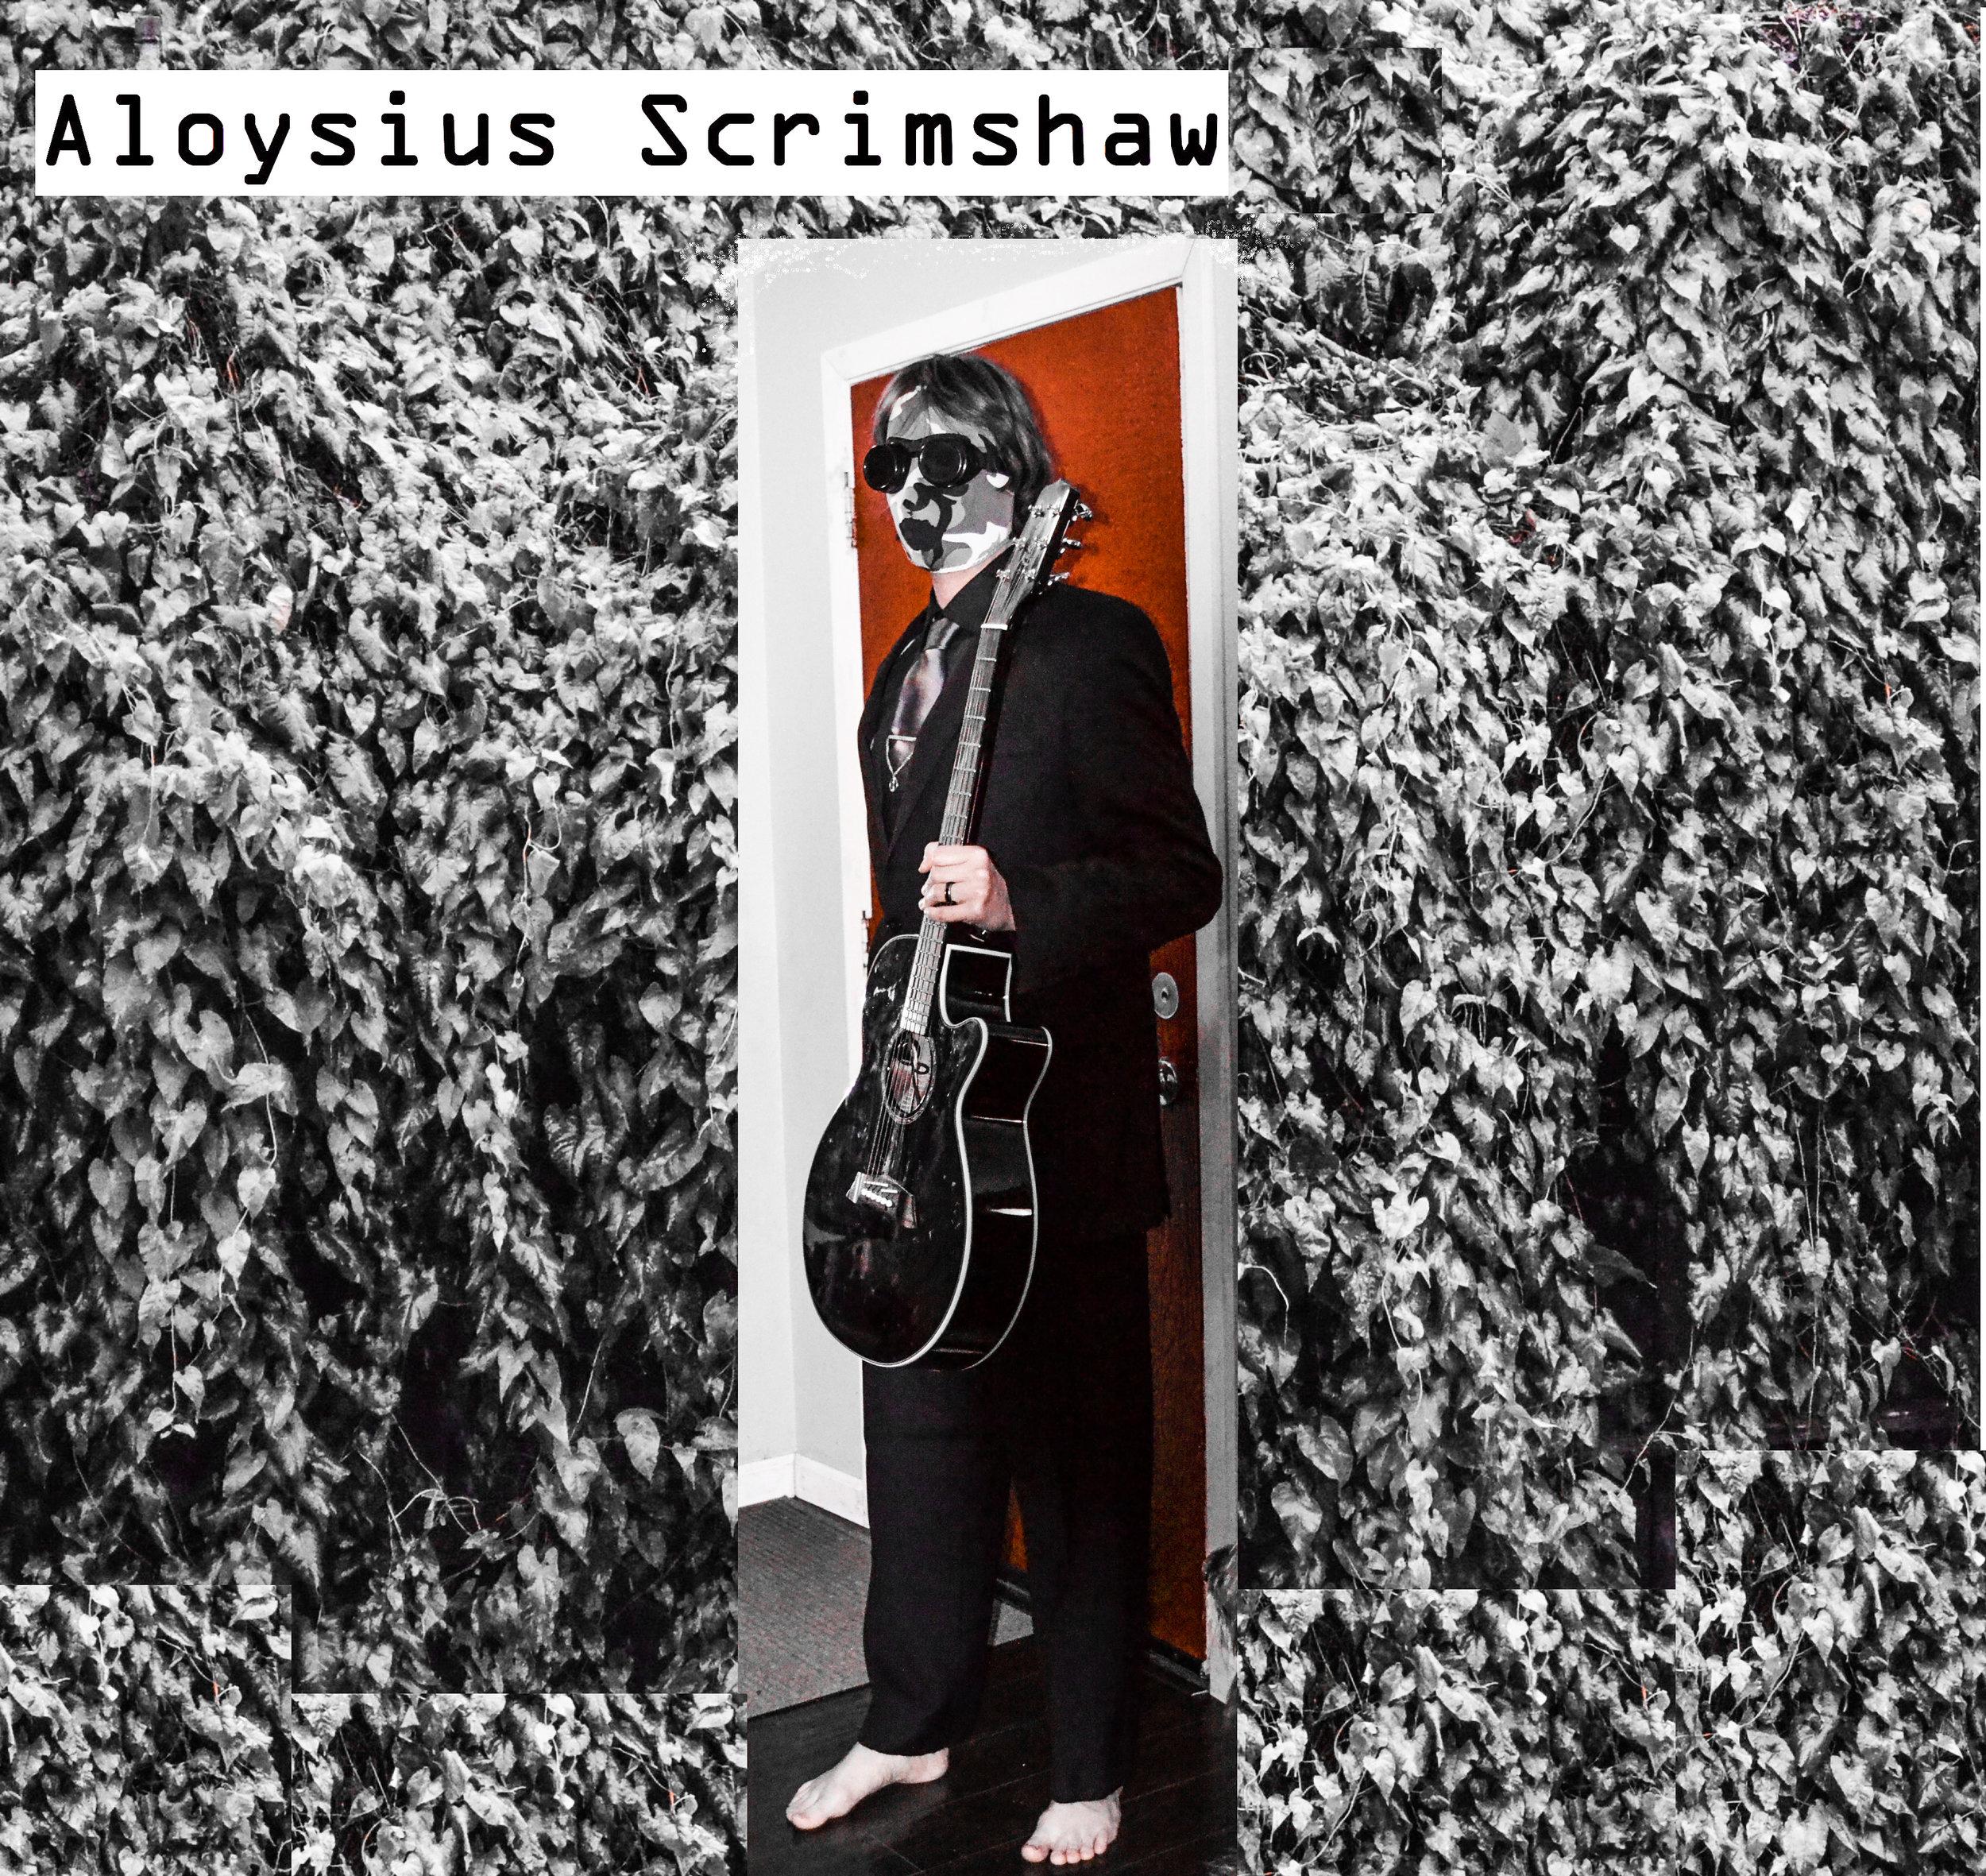 Aloysius Scrimshaw with guitar